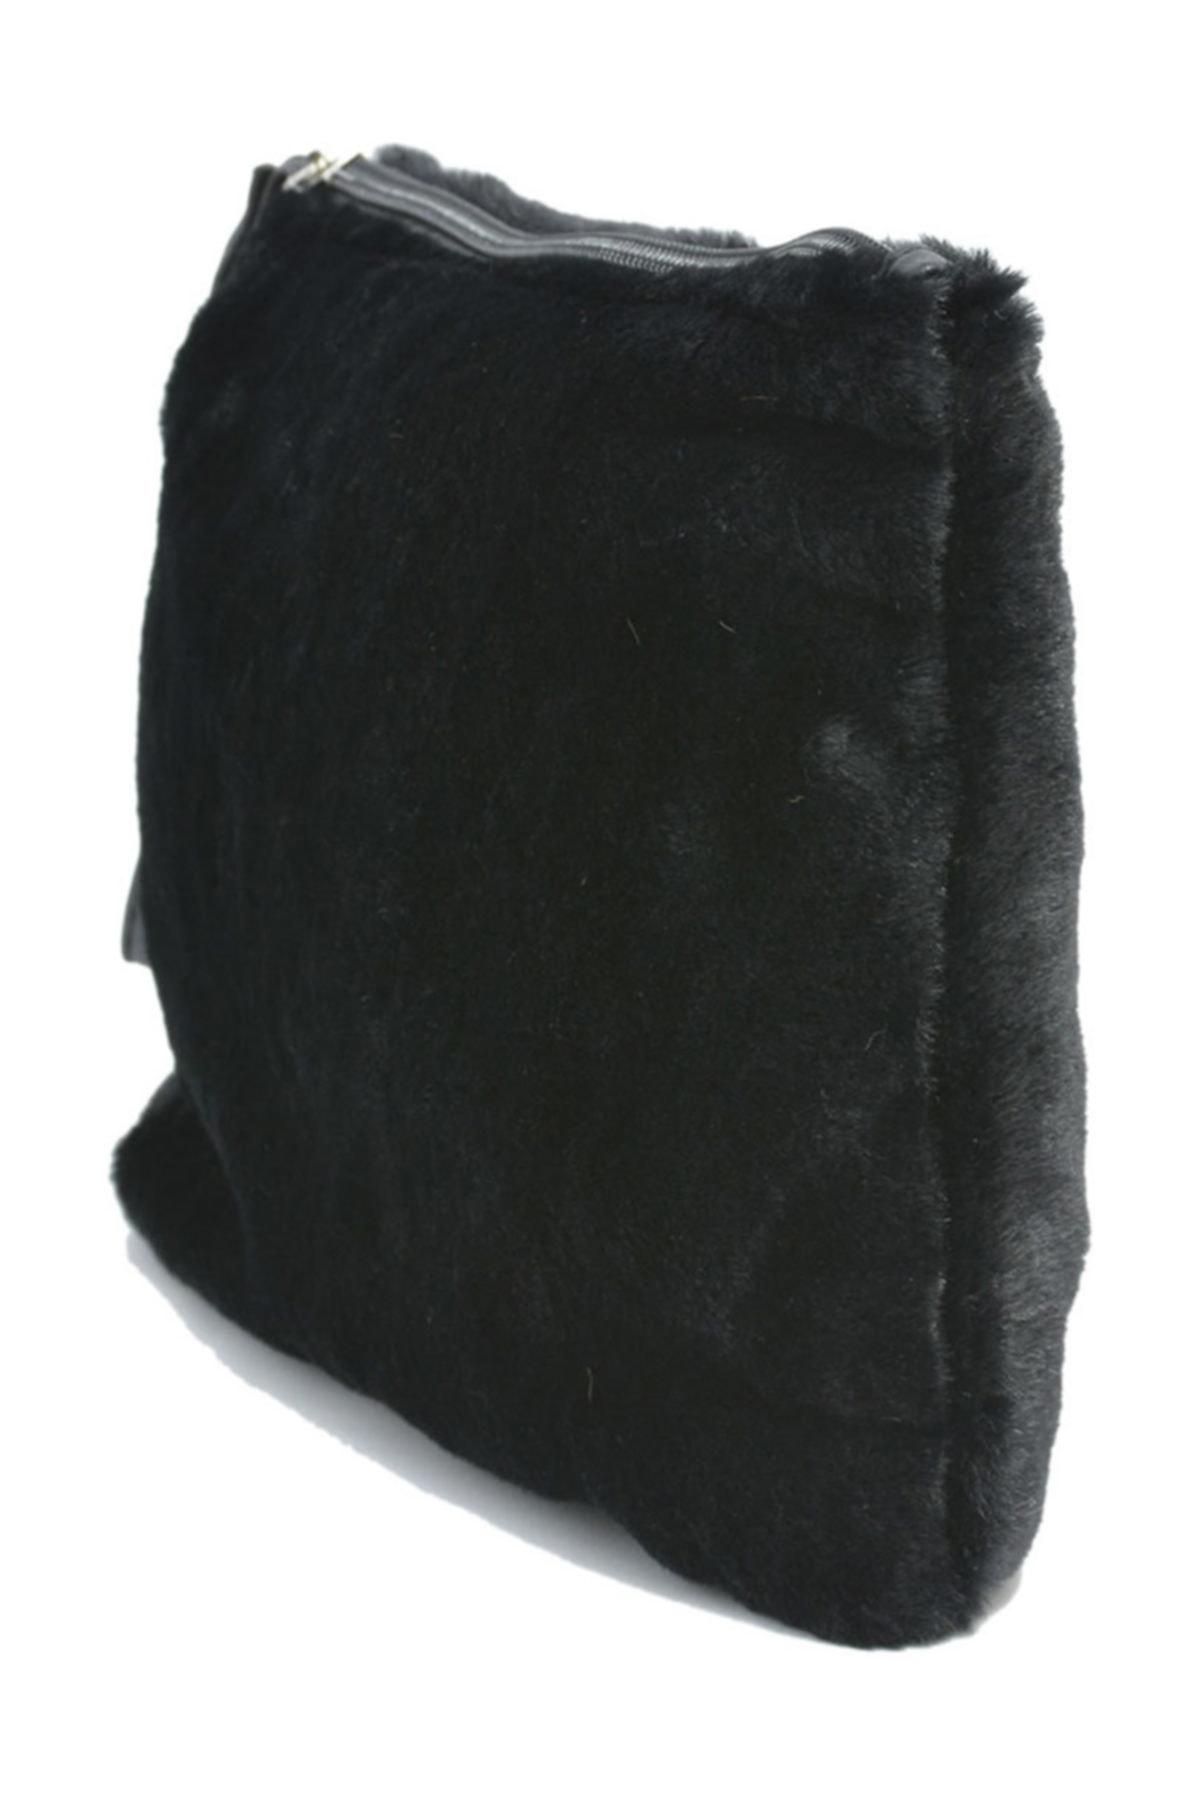 David Jones Kadın Clutch Çanta Siyah 2